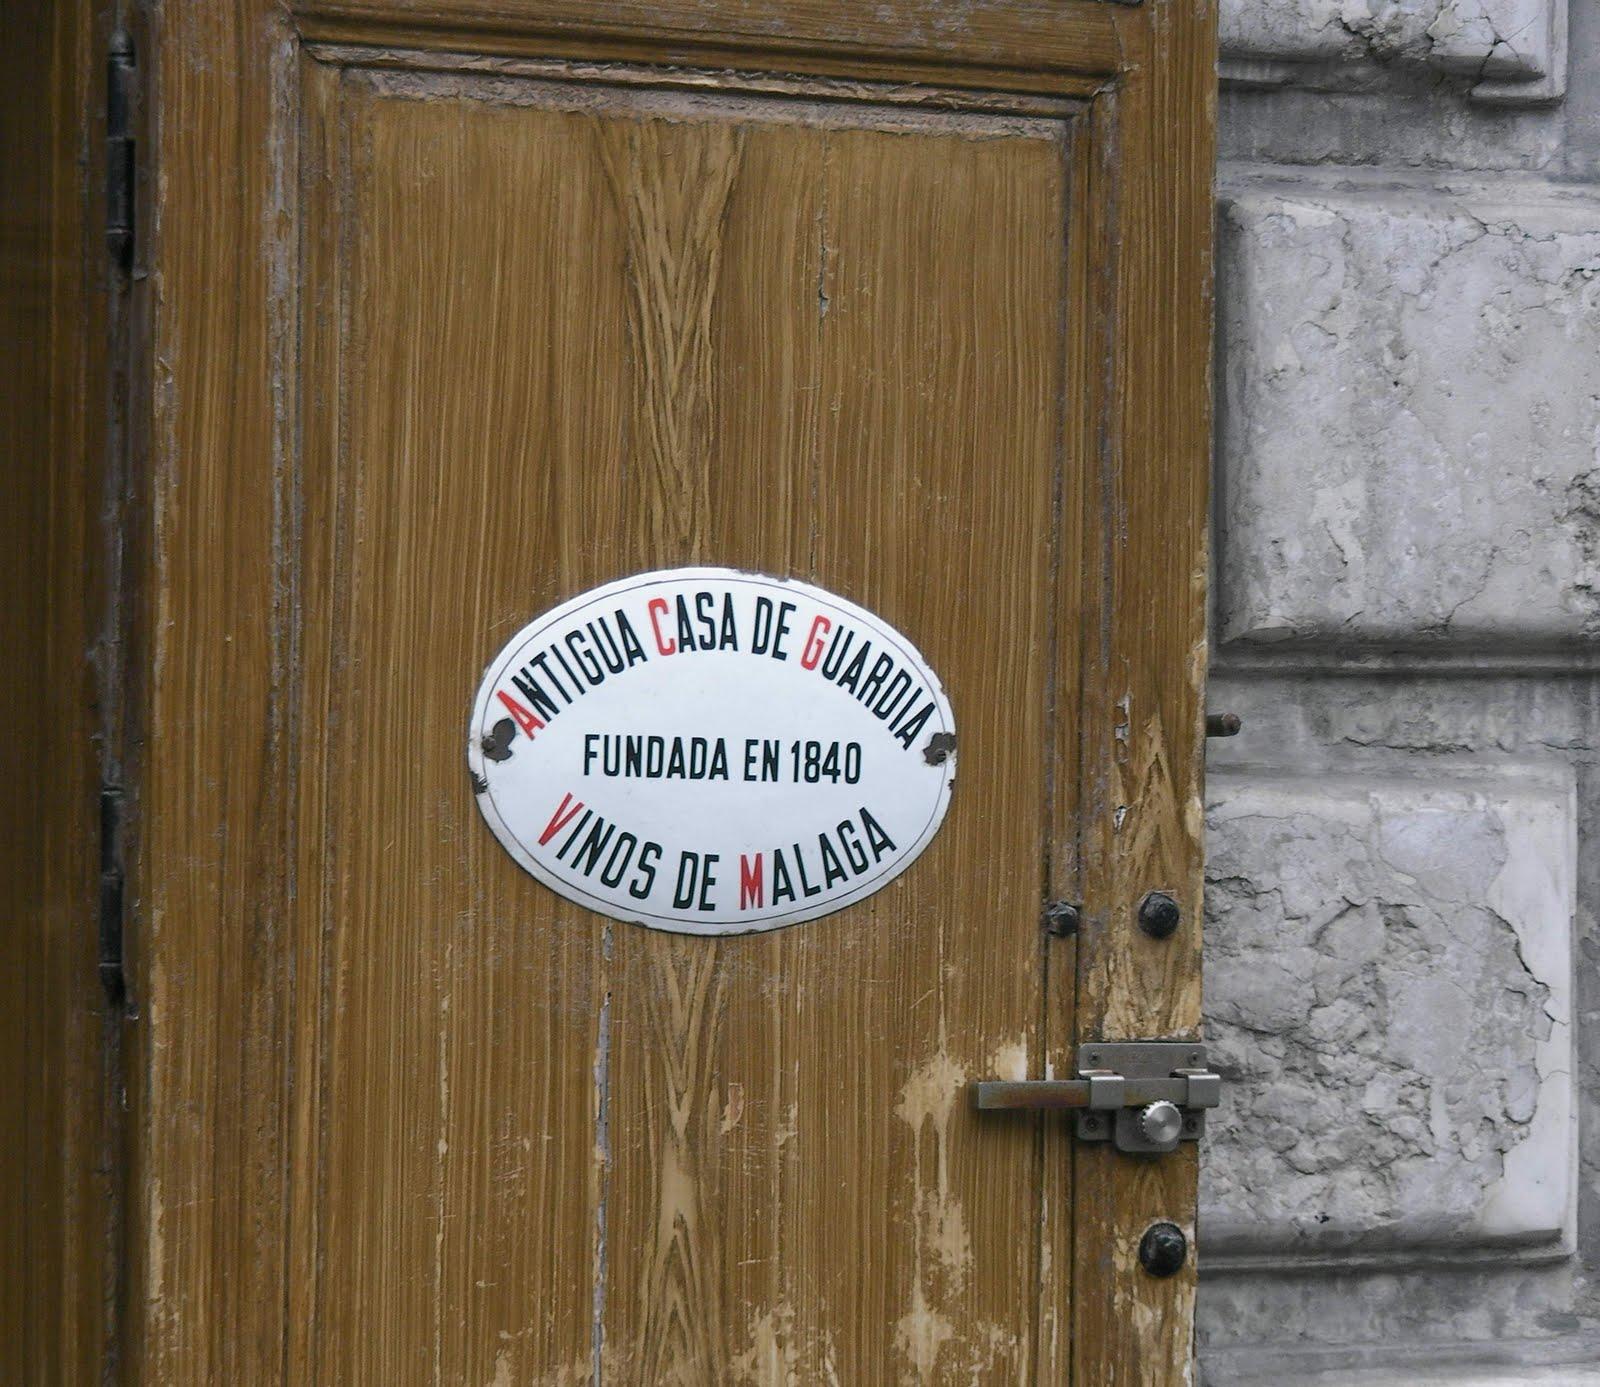 2011 espa a visite a la bodega antigua casa de guarda a malaga - Casa plus malaga ...